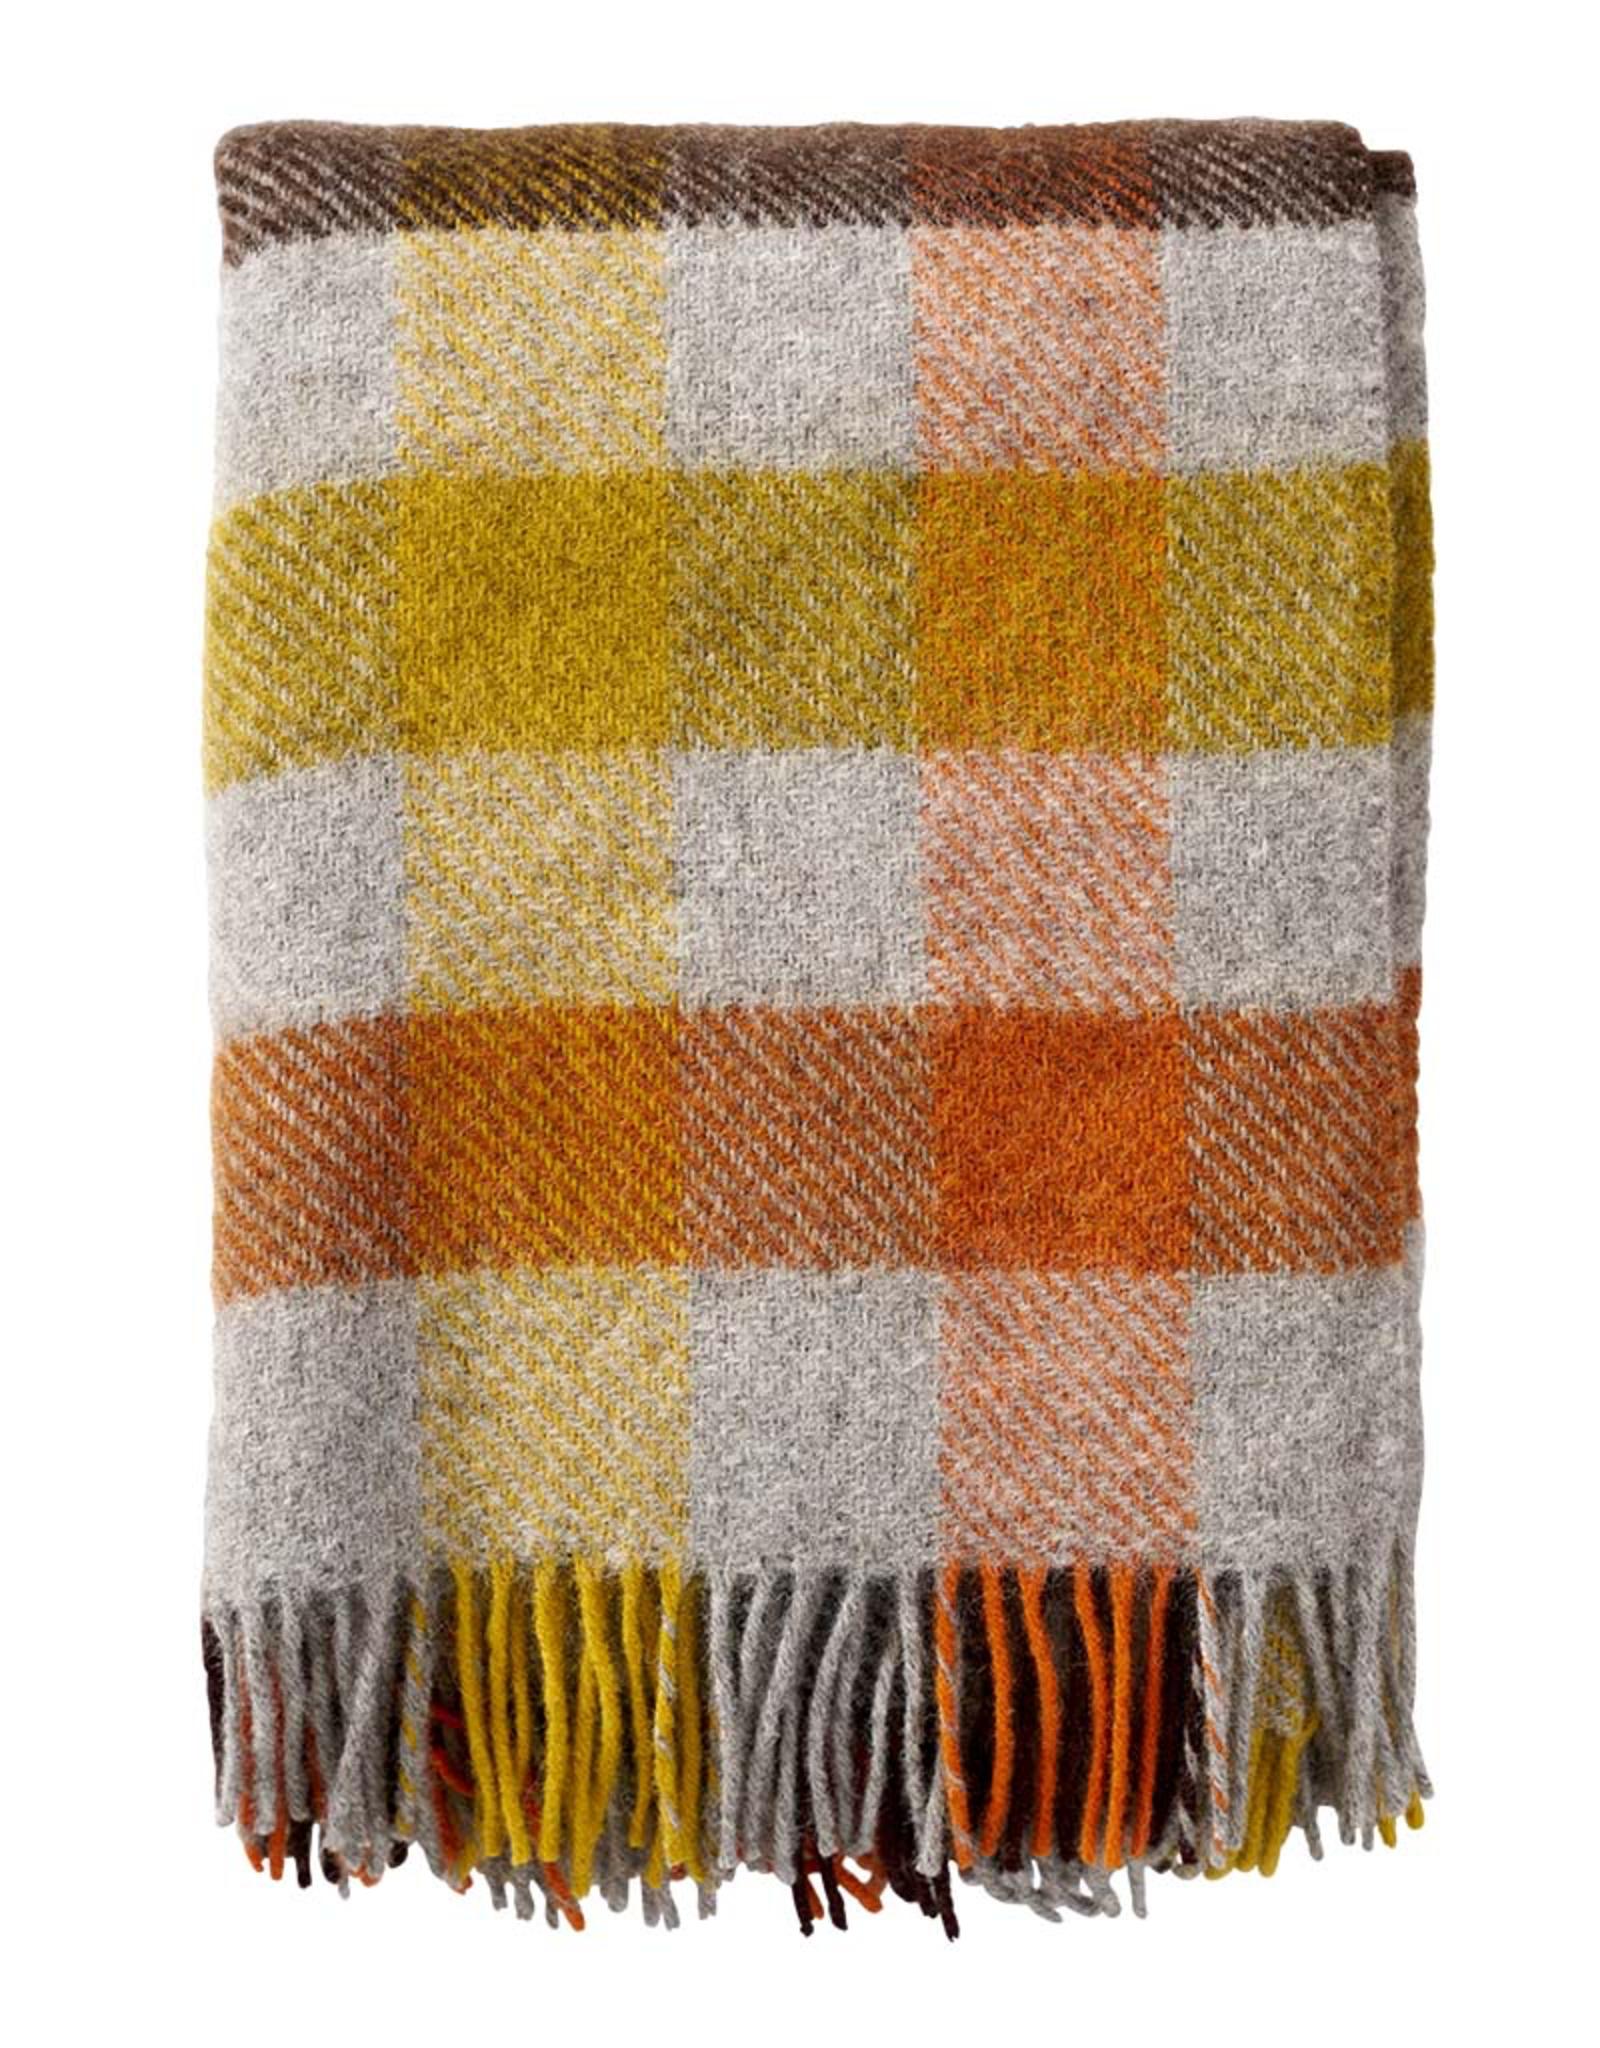 Gotland Wool Throw - Multi Yellow